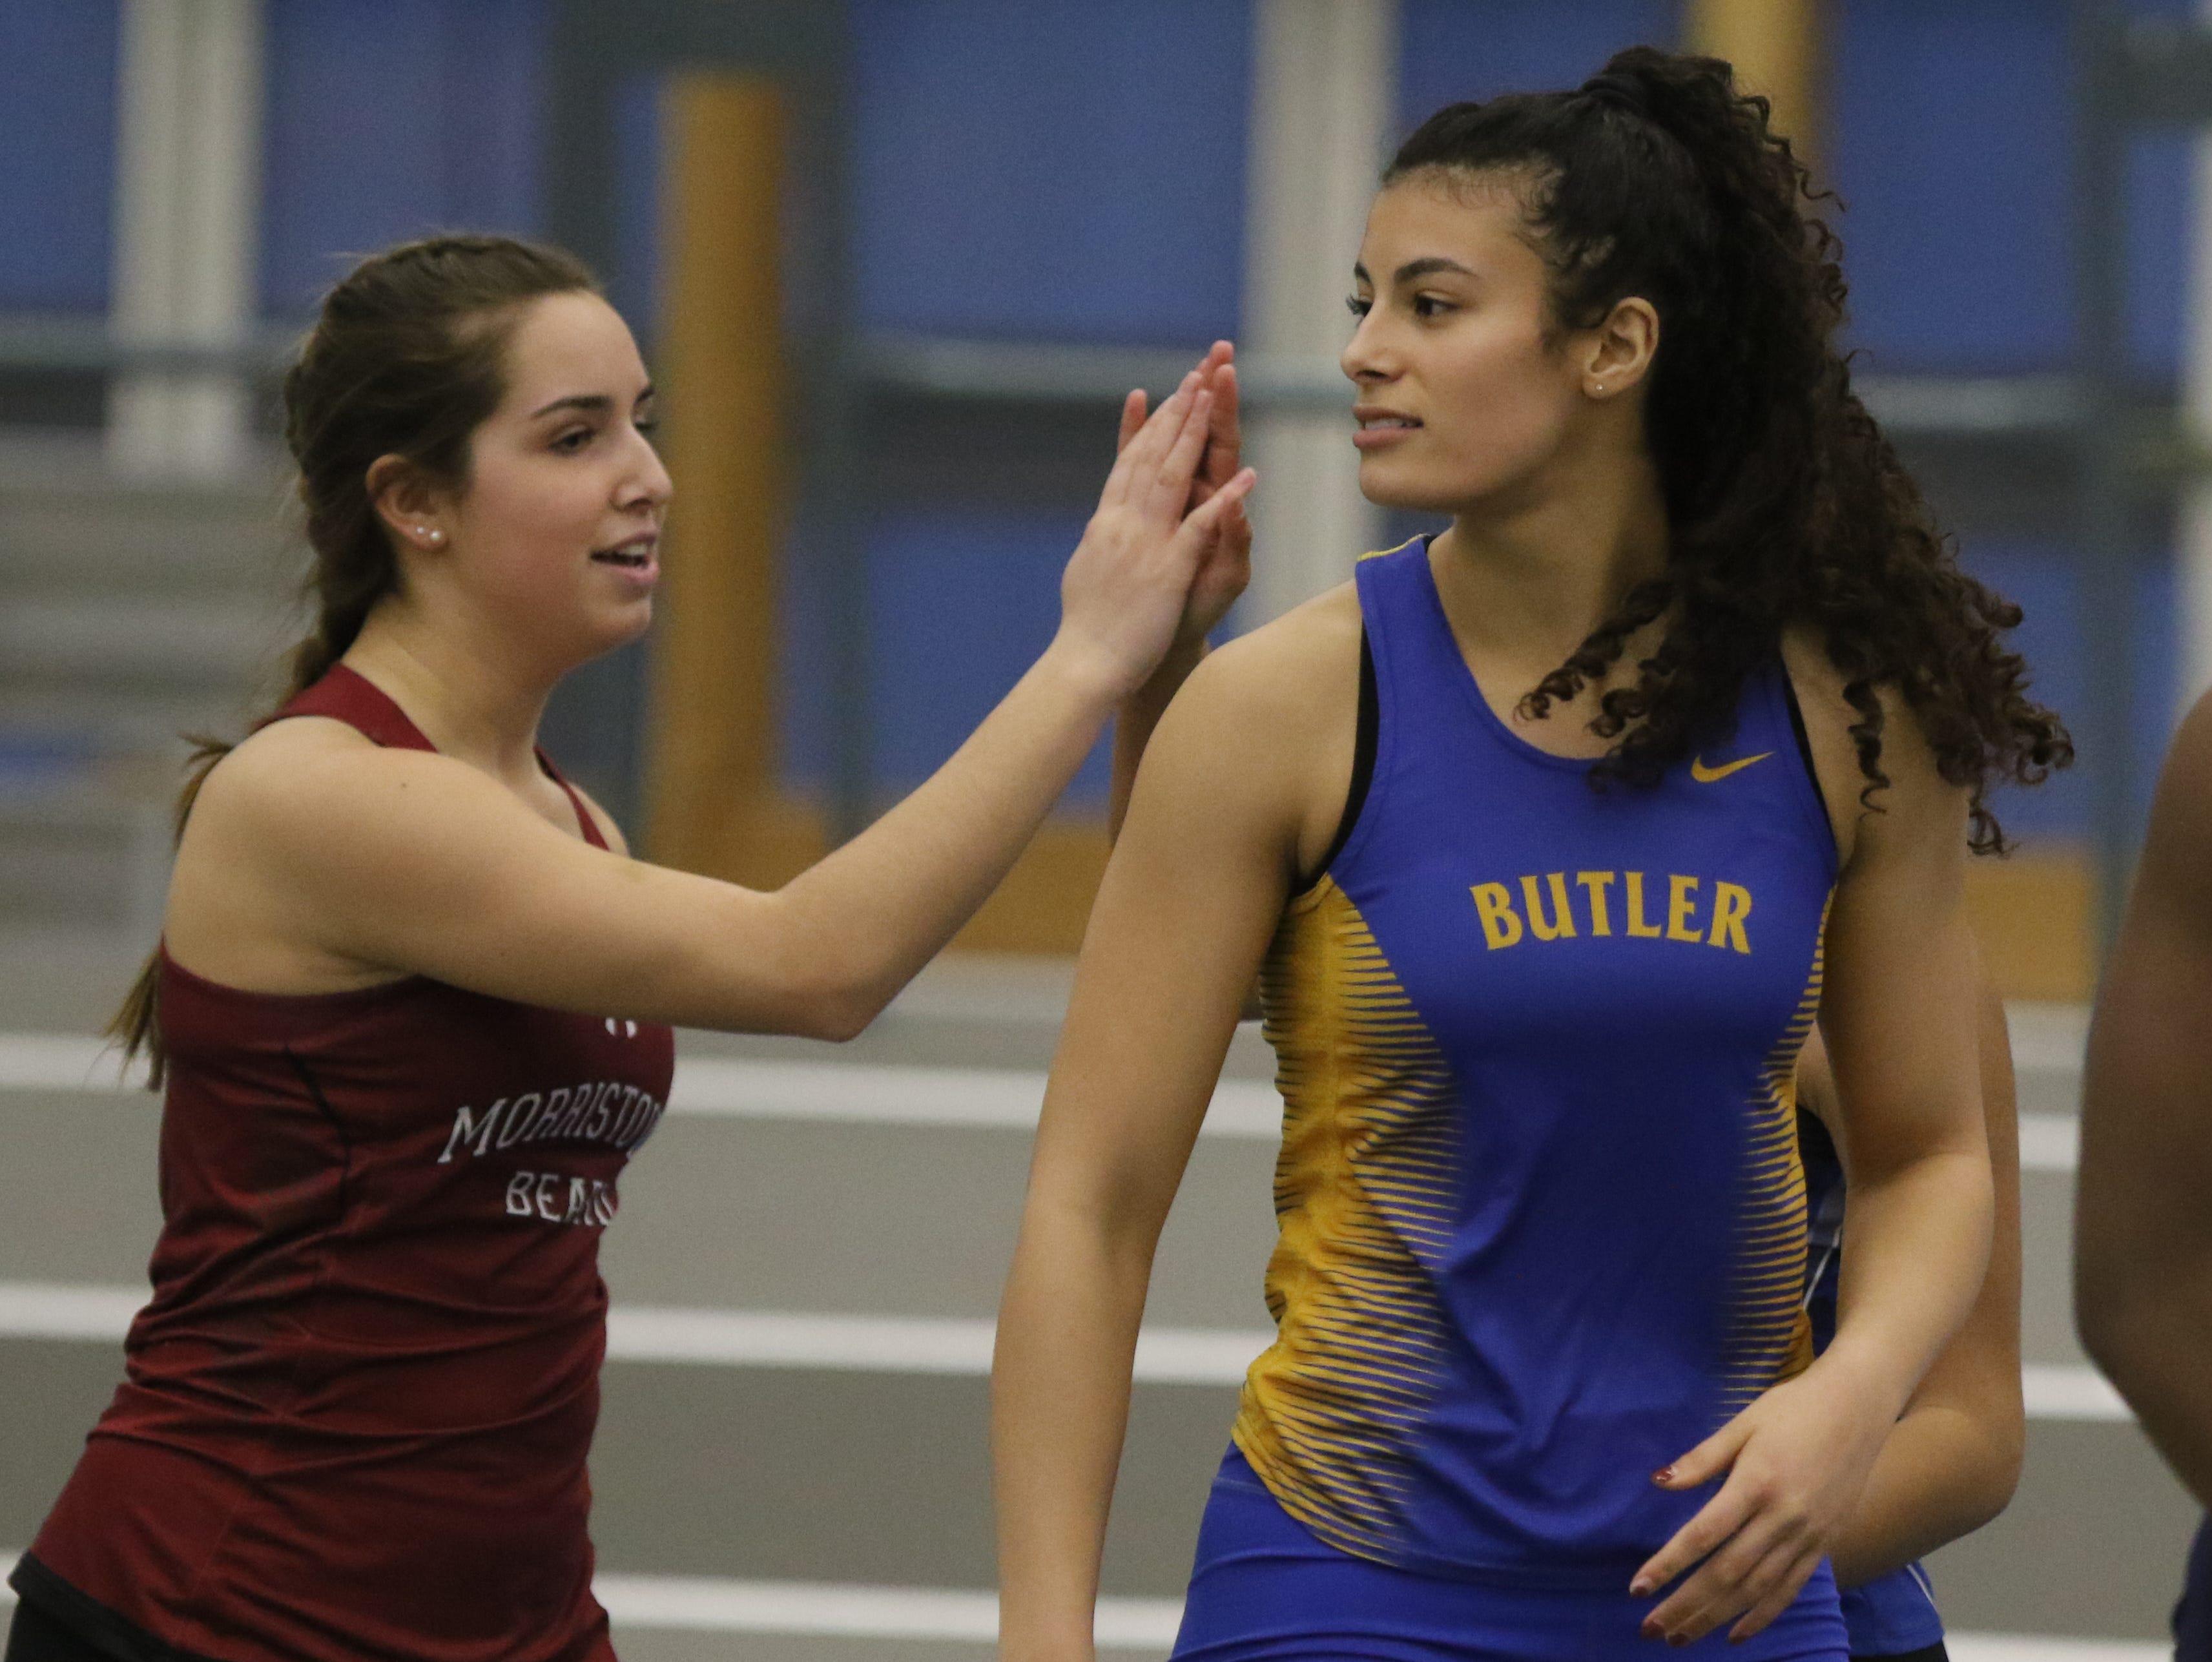 Nicole Borowiec of Morristown Beard congratulates Rebecca Kneppel of Butler after Kneppel won the girls 55 meter dash.